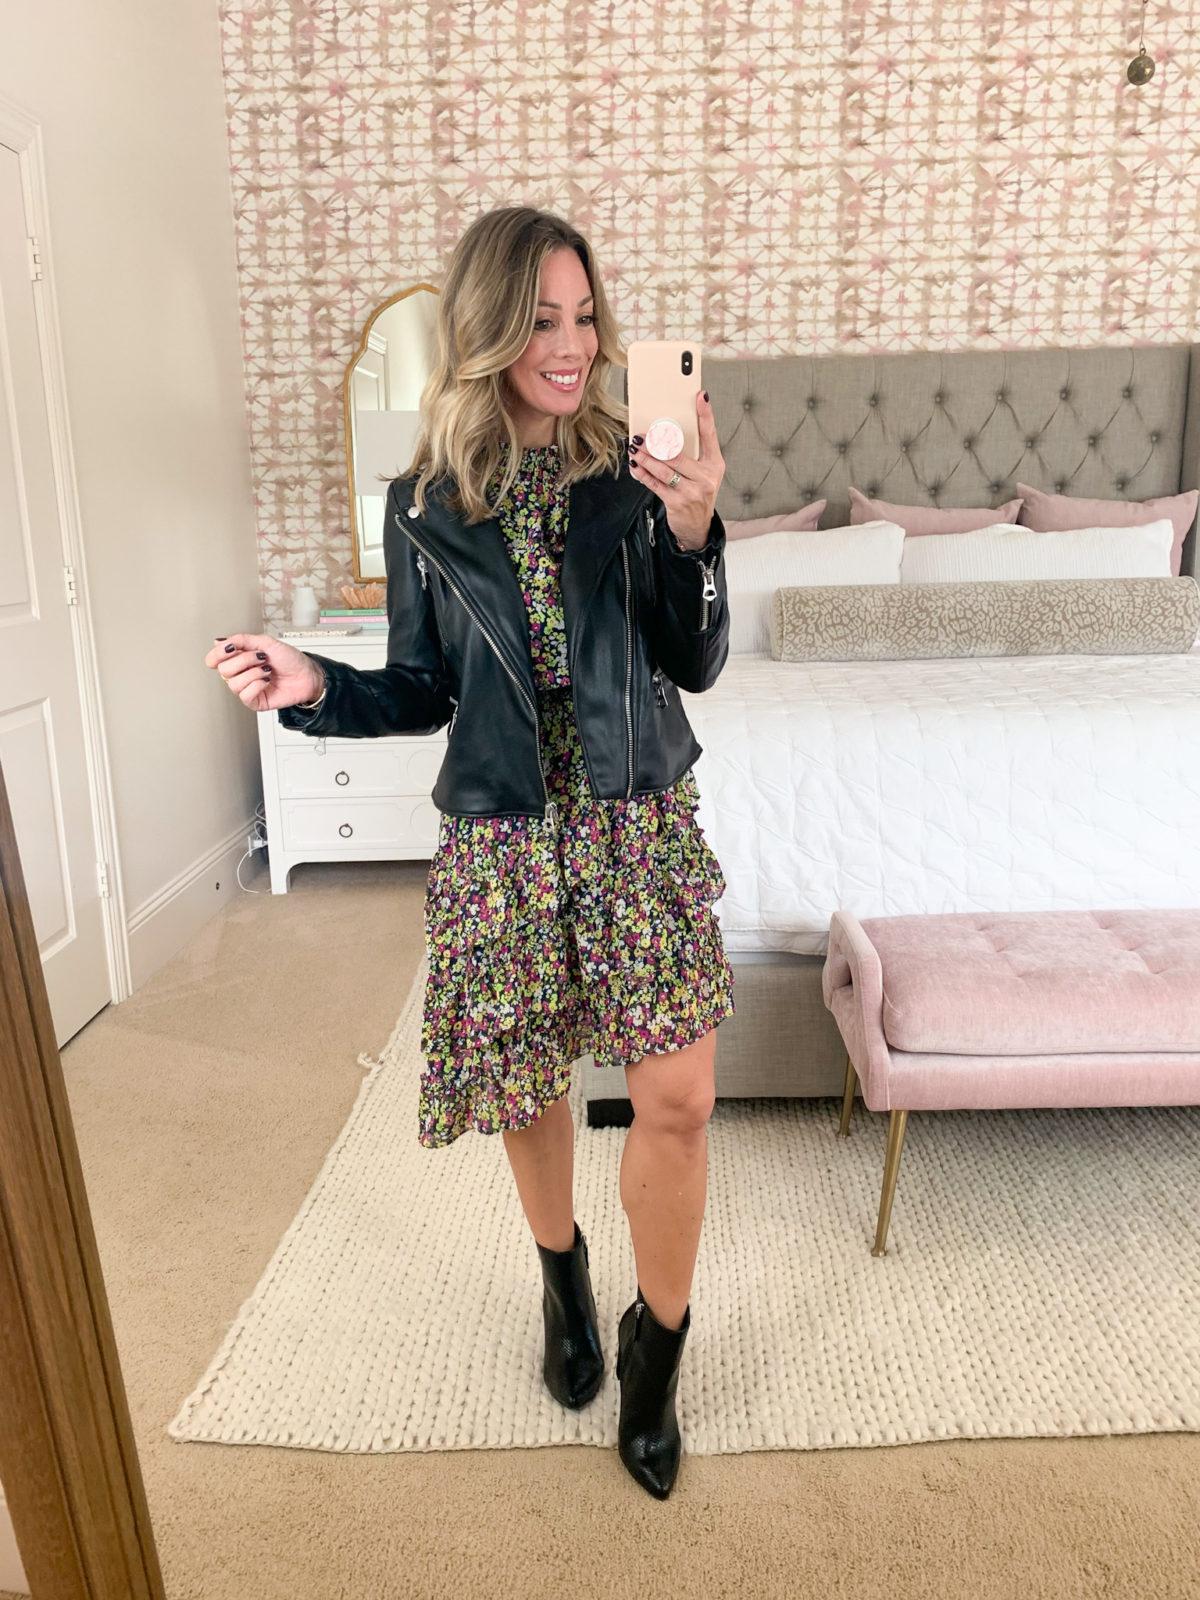 Walmart Fashion, Moto Jacket, Floral Midi Length Dress, Booties